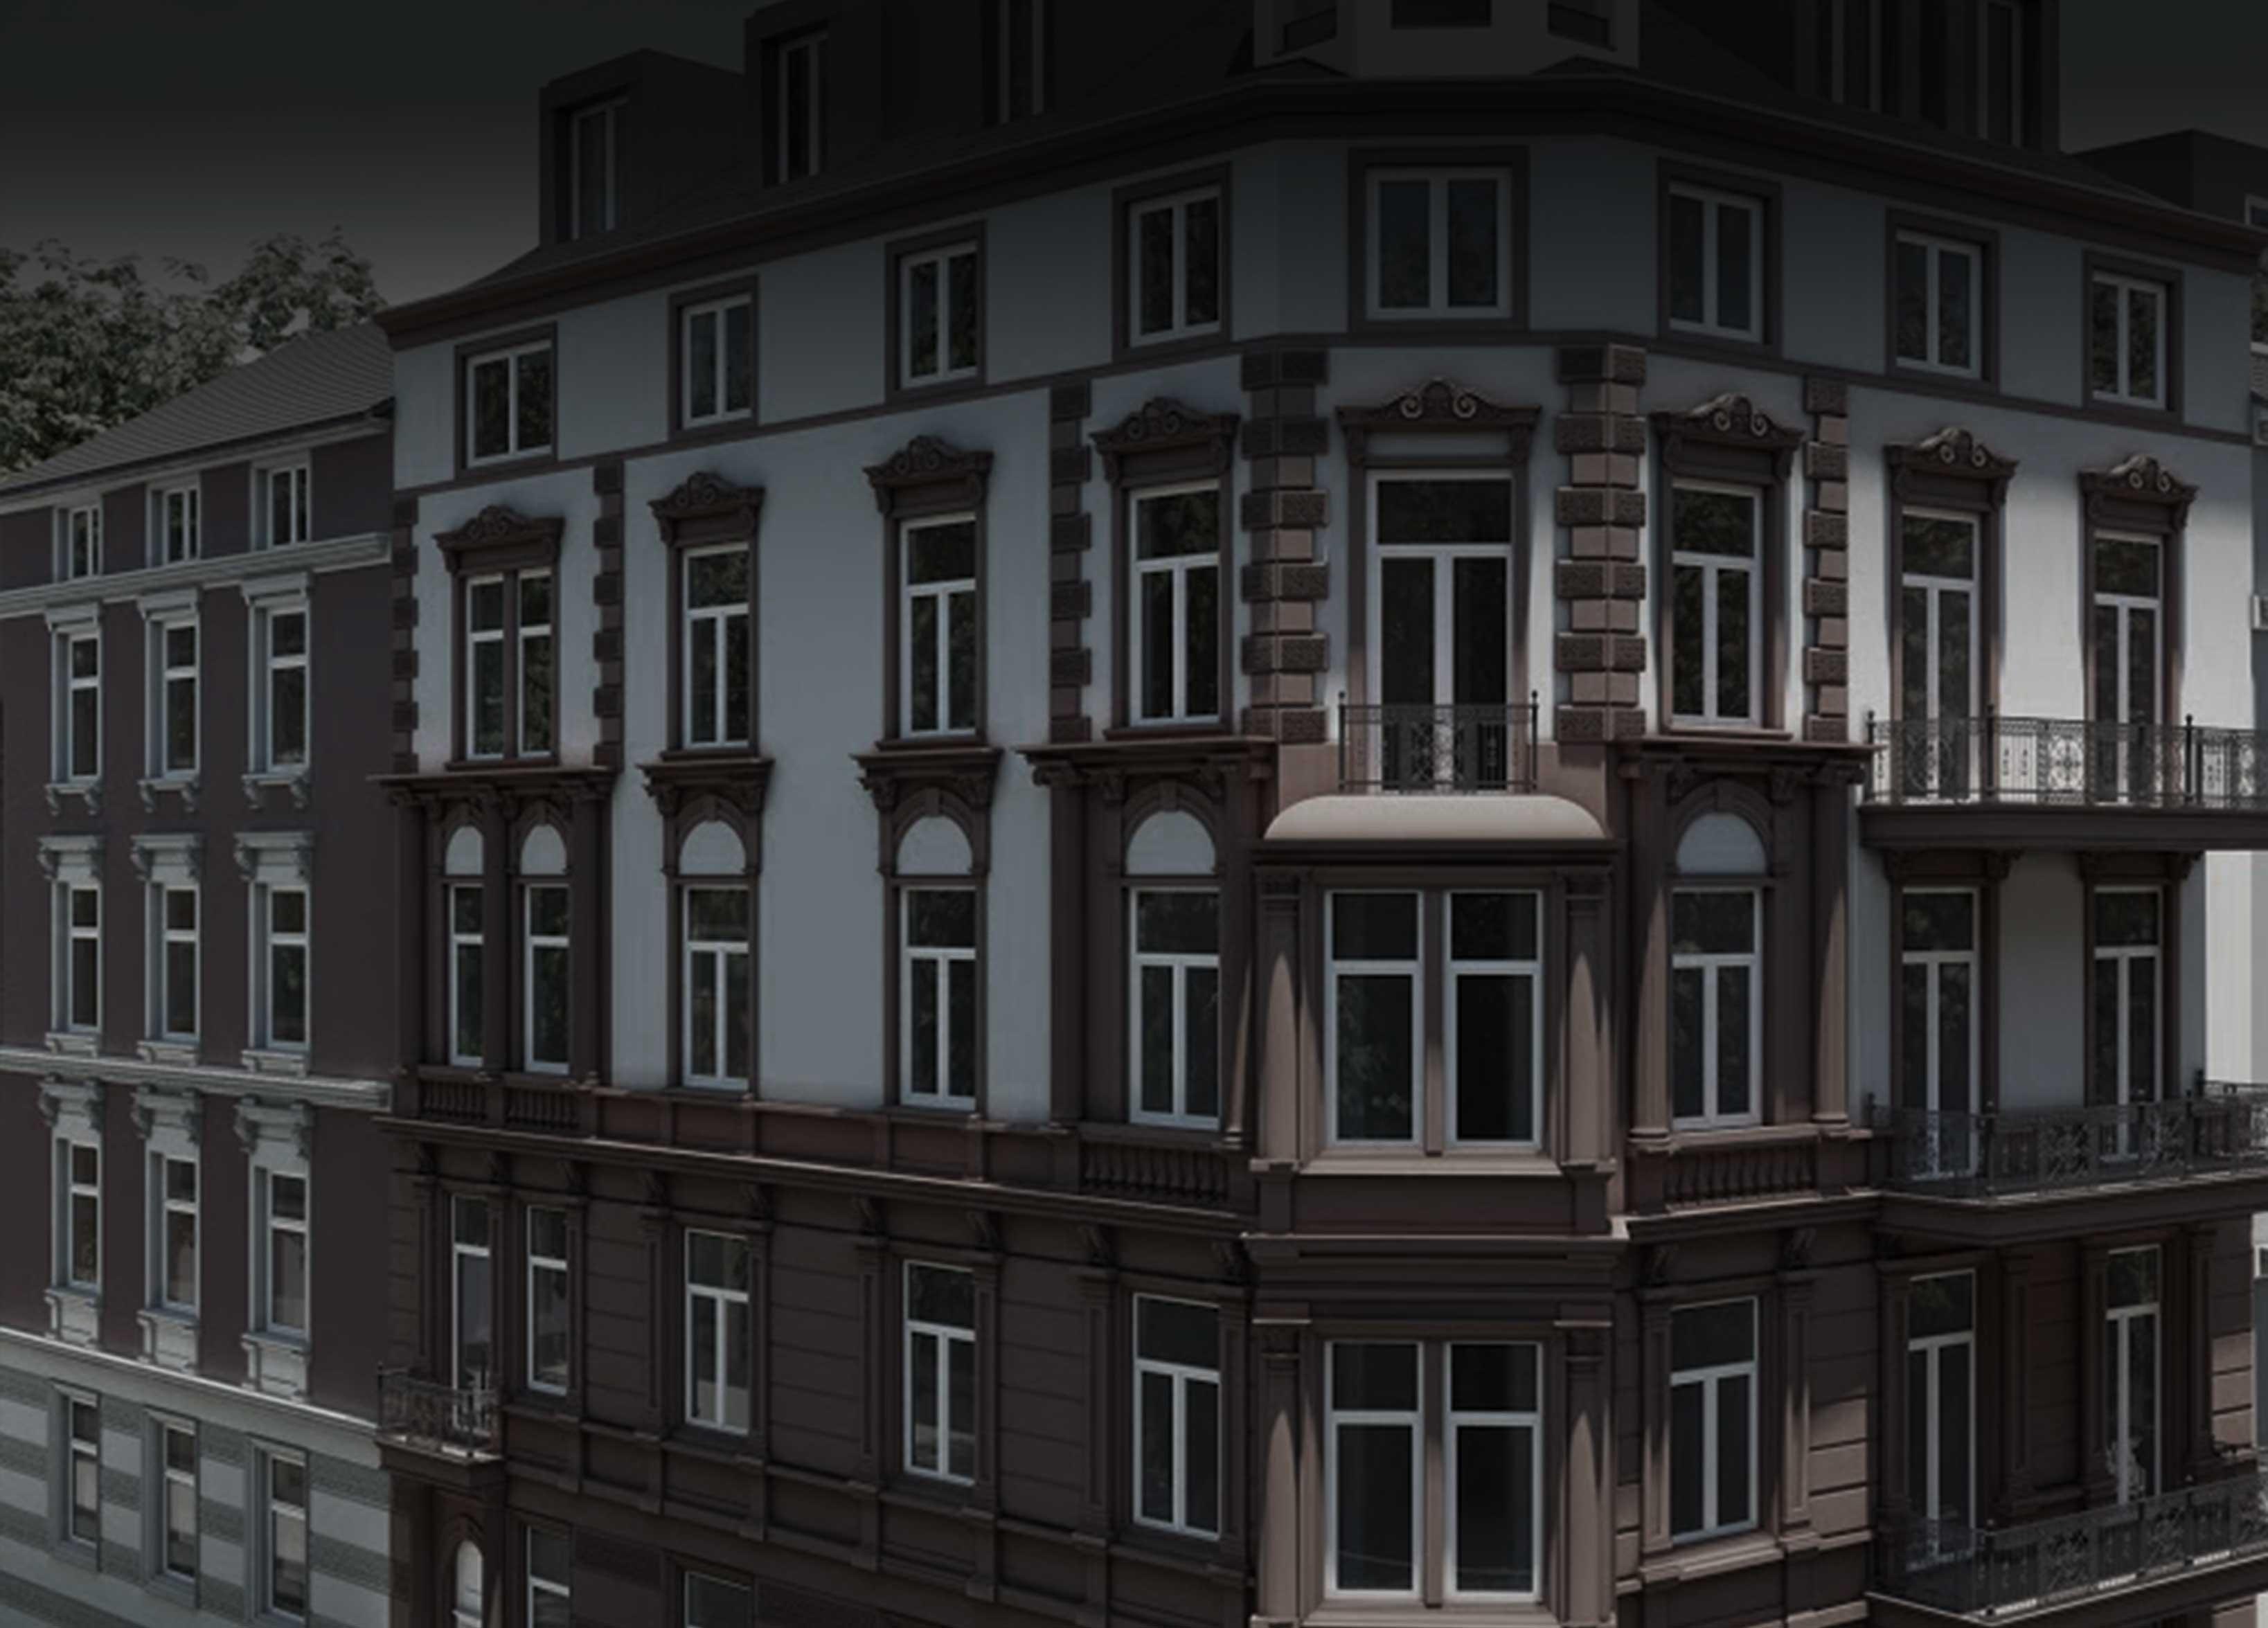 2015-10-20_hanauer_001-3